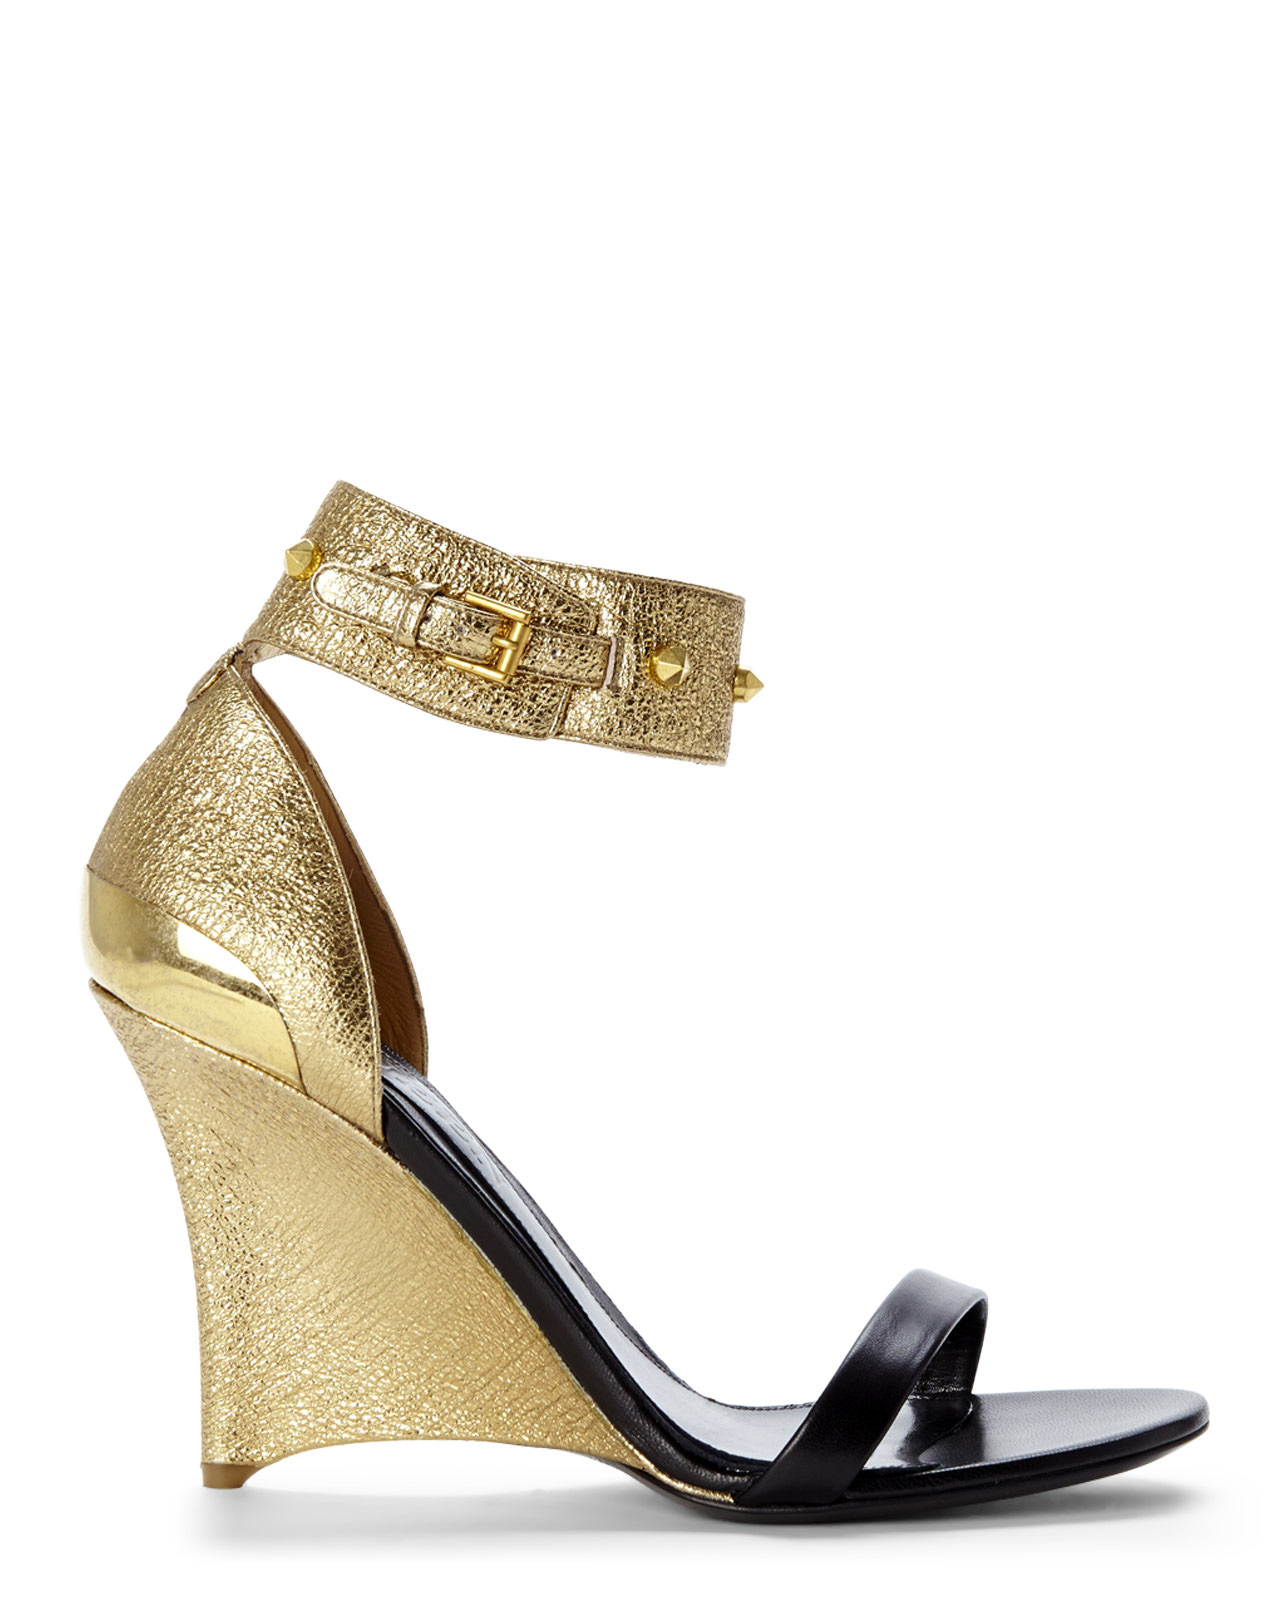 581a5381a68 Lyst - Alexander McQueen Black   Gold Wedge Sandals in Metallic